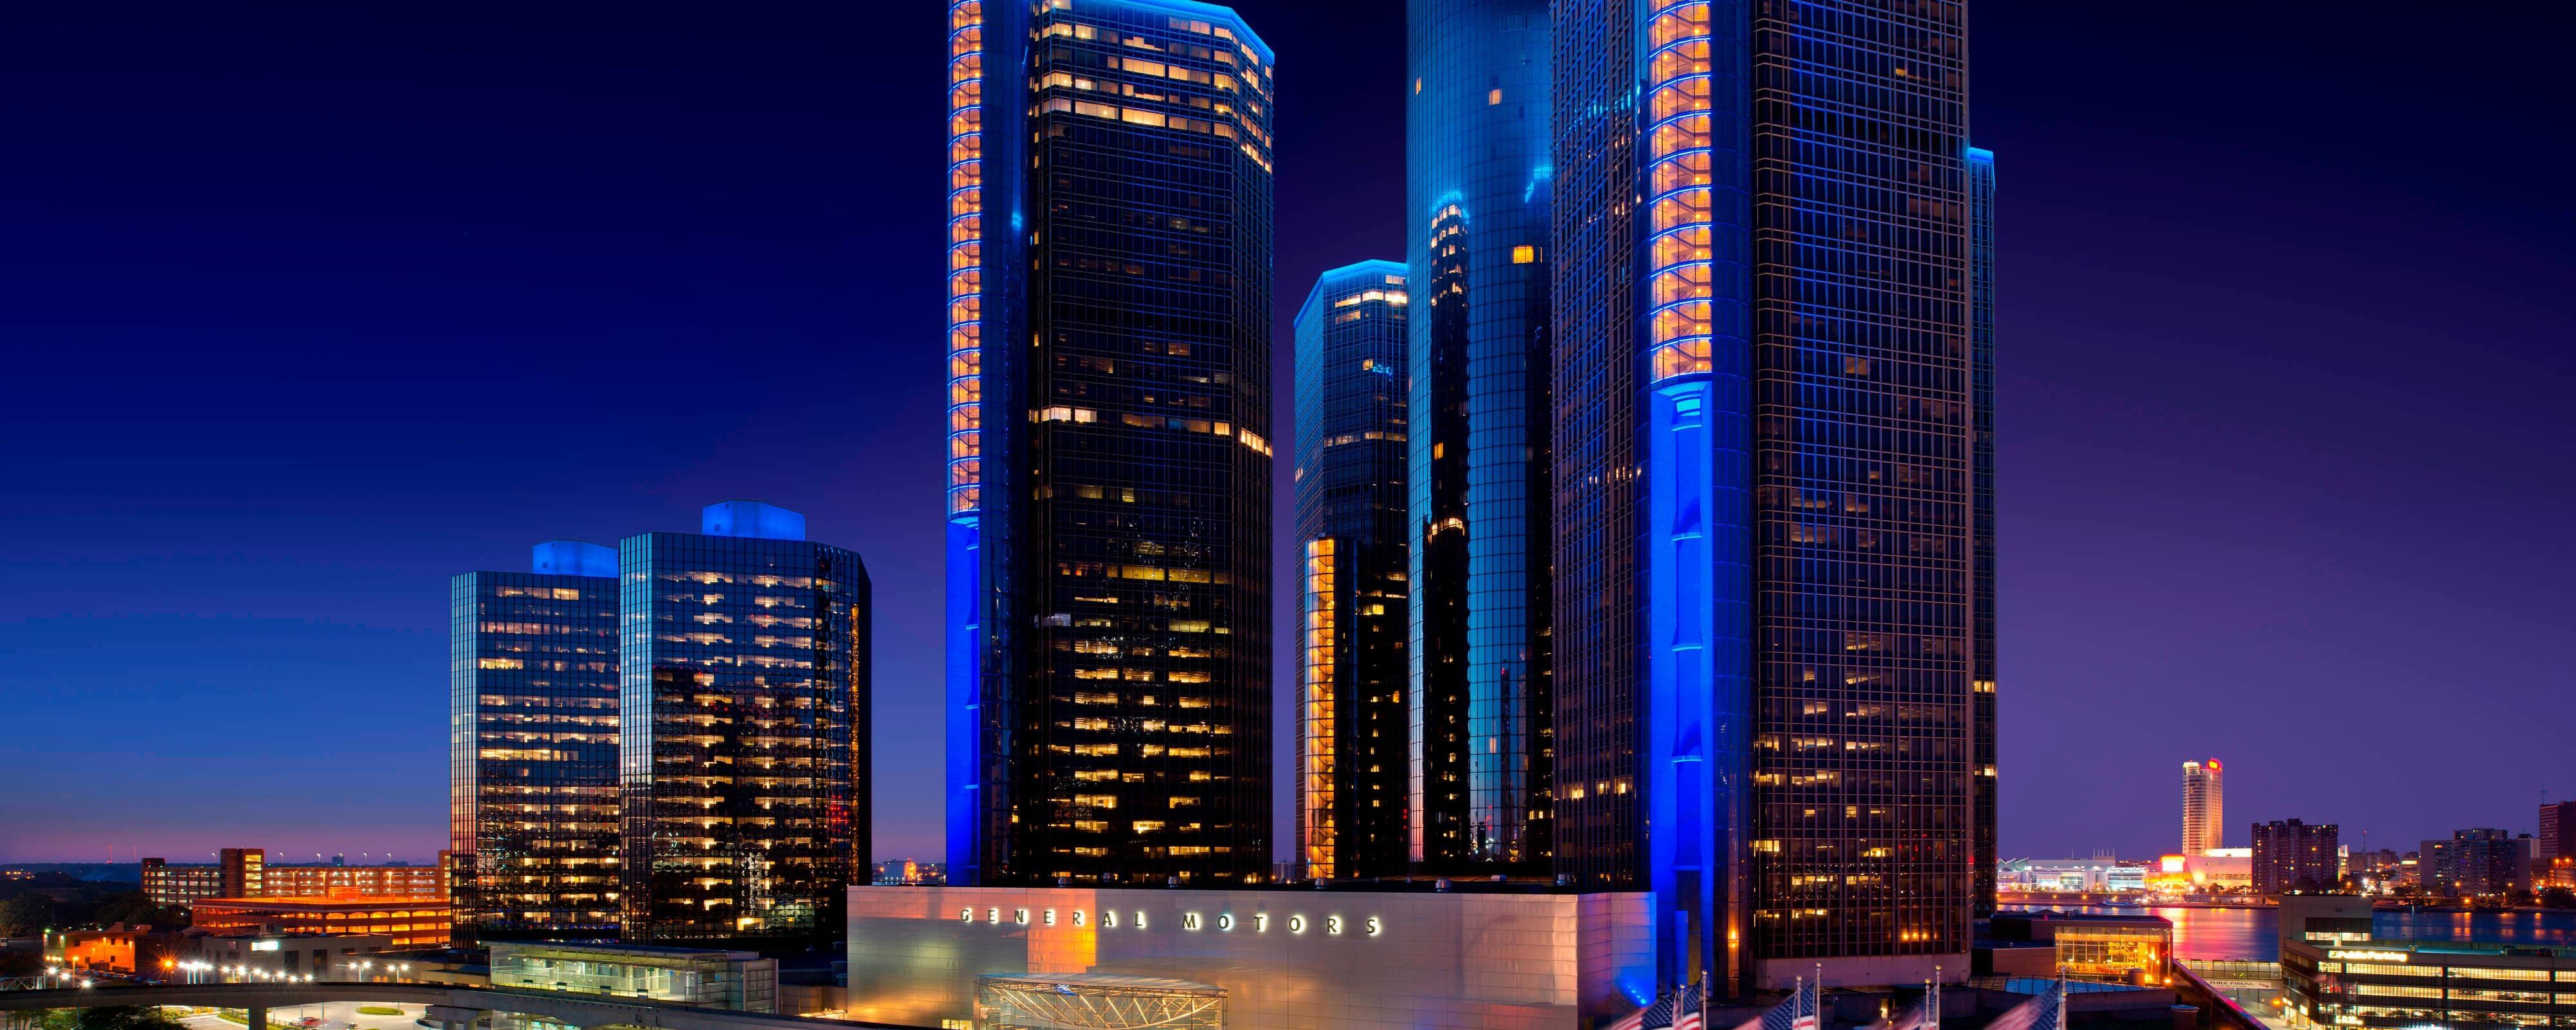 Detroit Hotel